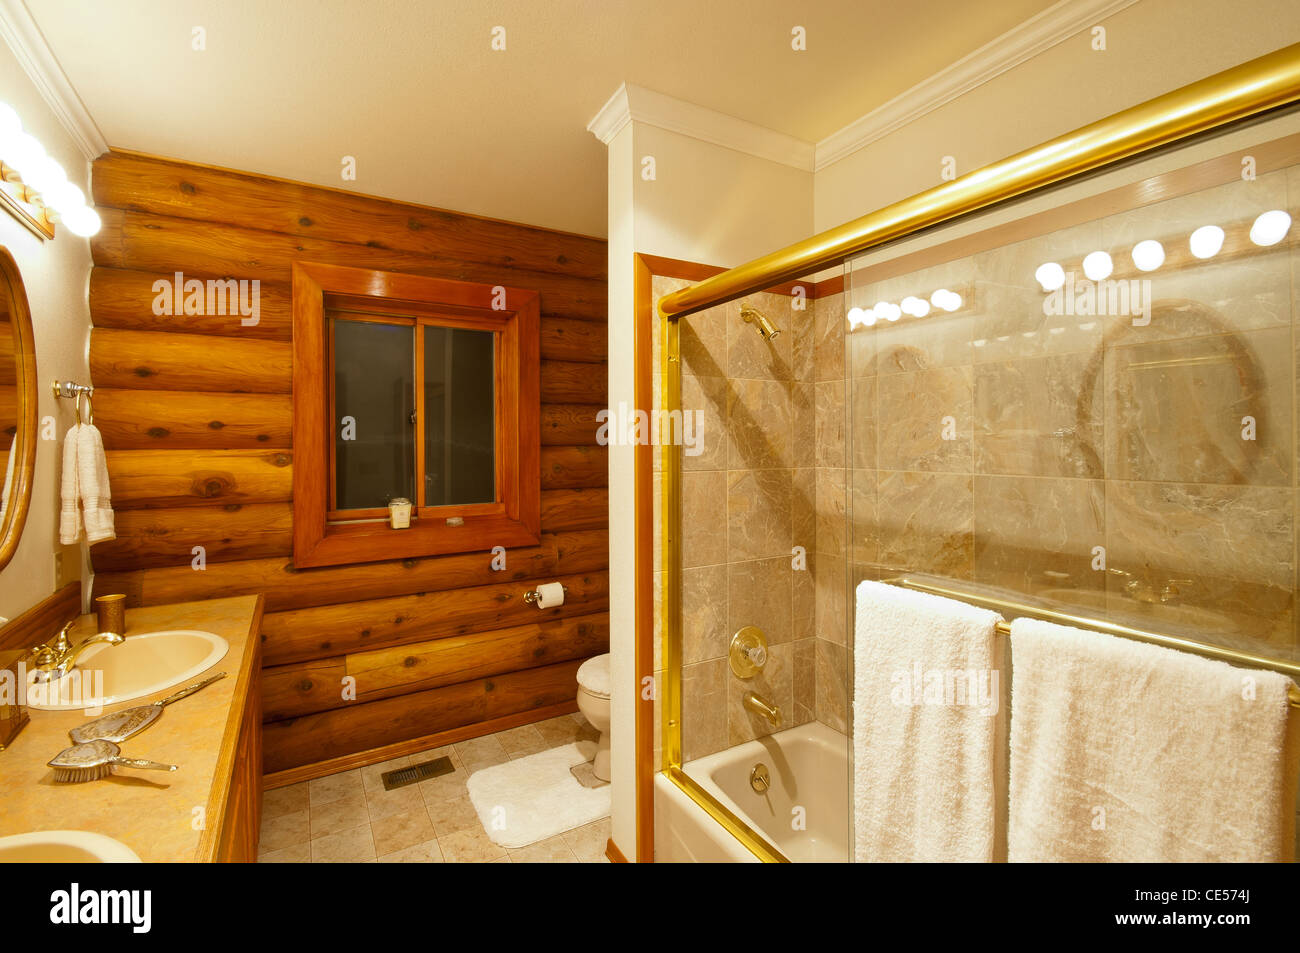 Salle de bains de luxe en log cabin avec baignoire avec ...